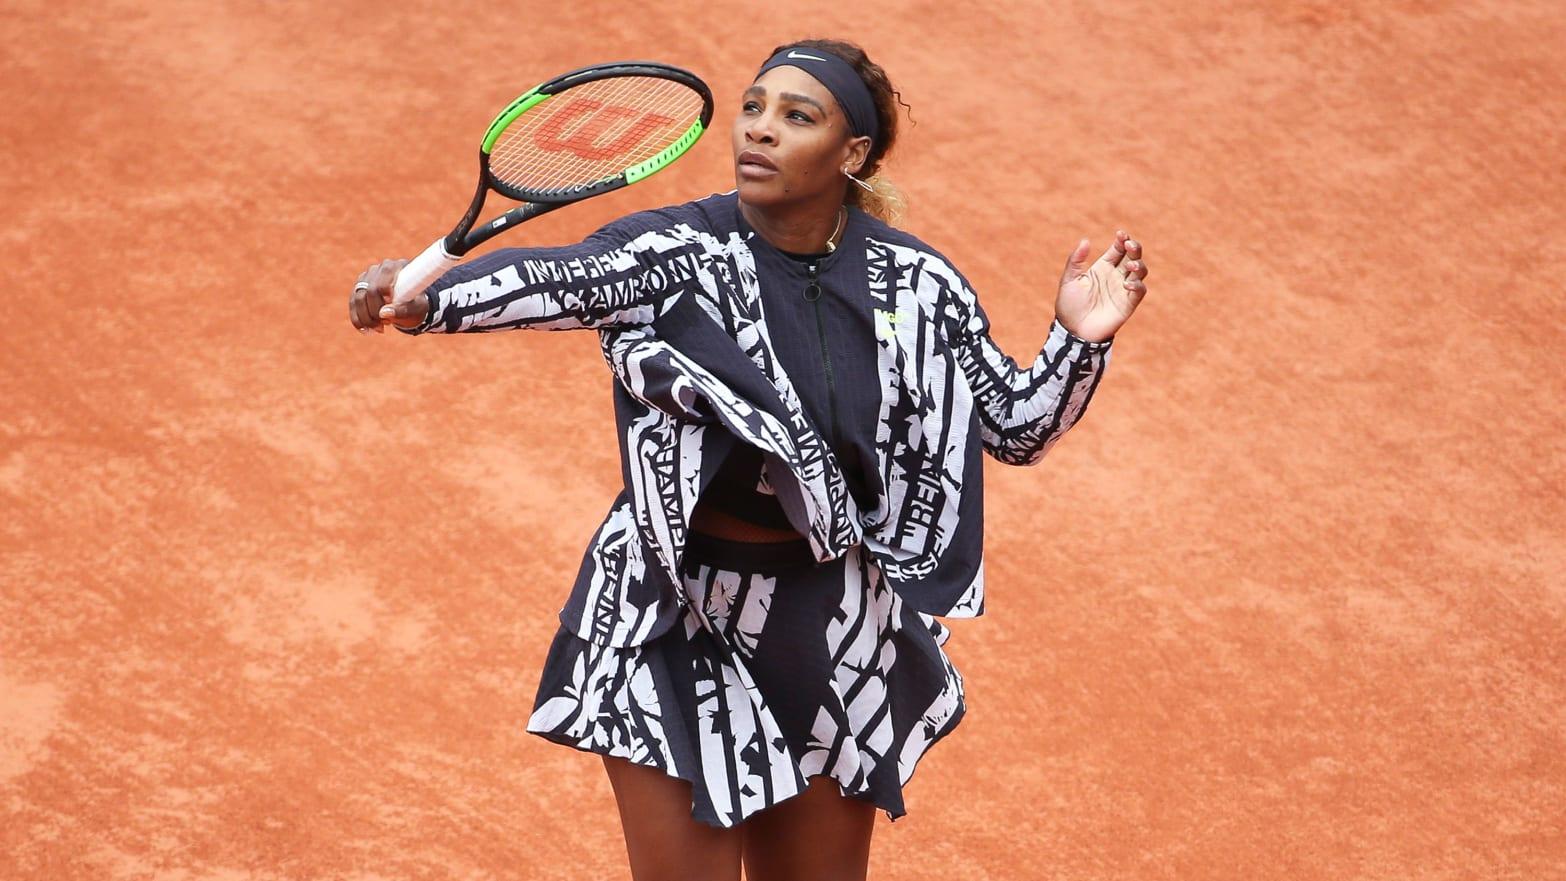 b770d015 Champion,' 'Queen,' 'Goddess,' 'Mother': Serena Williams' Powerful ...